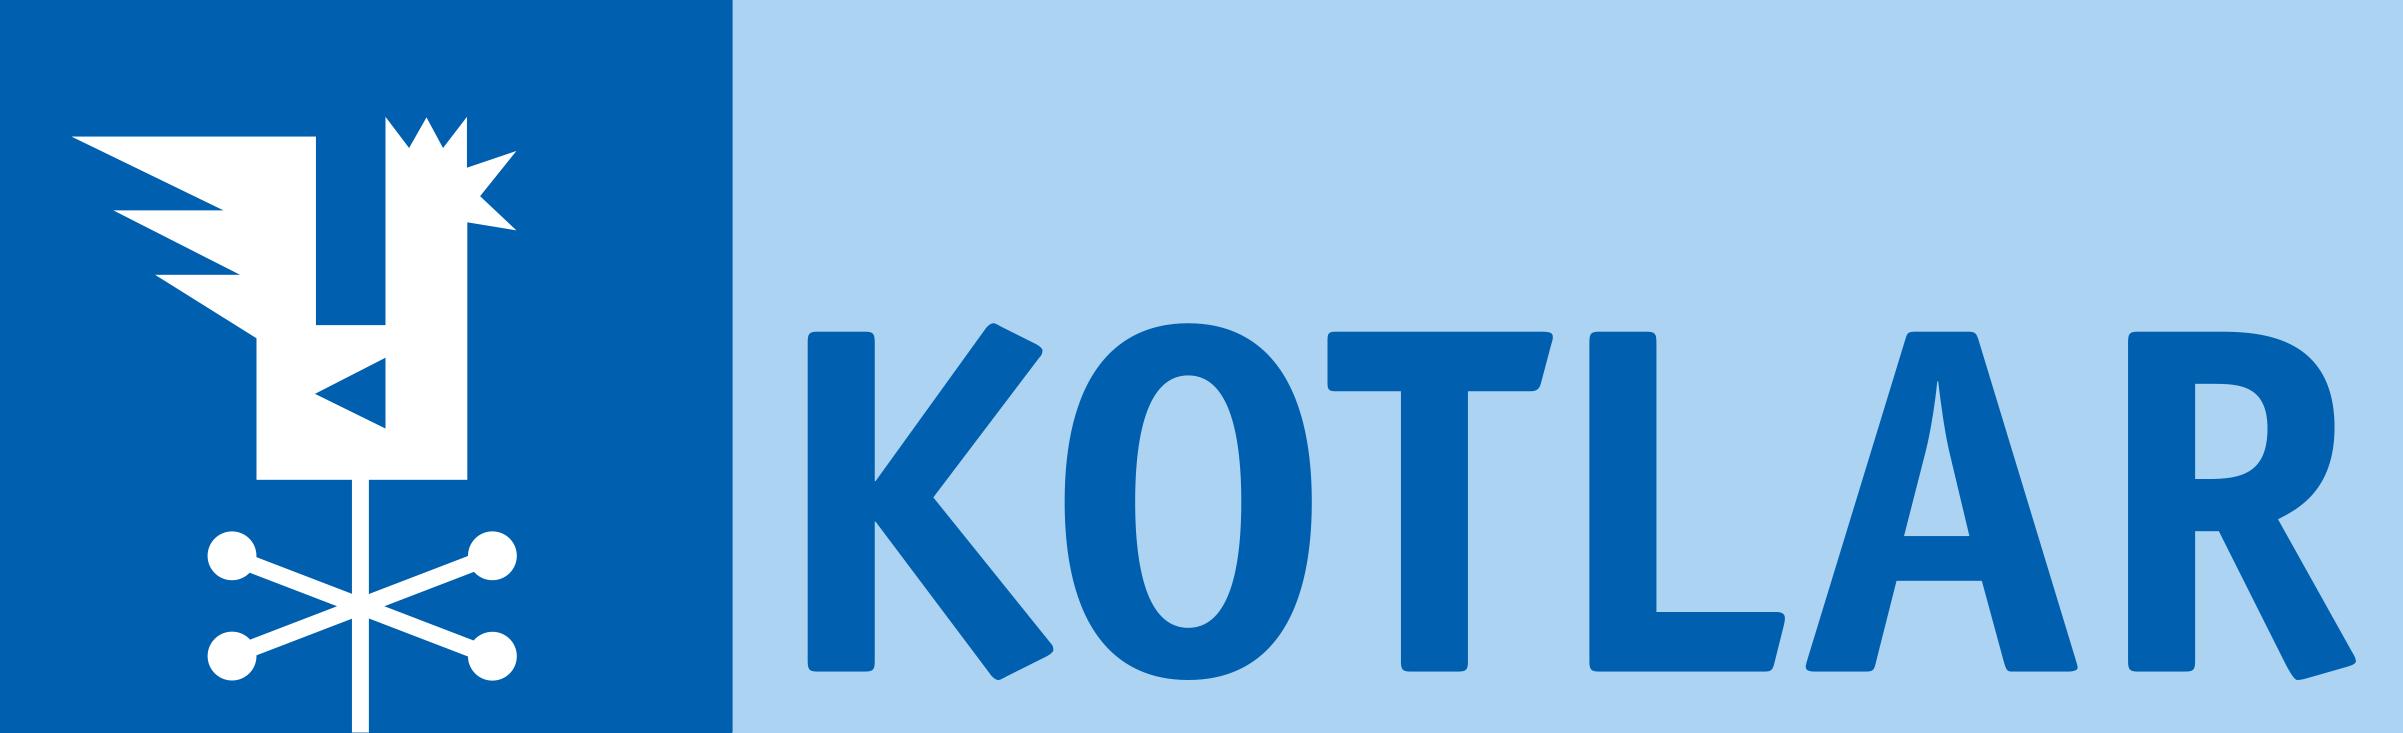 Kotlar logo